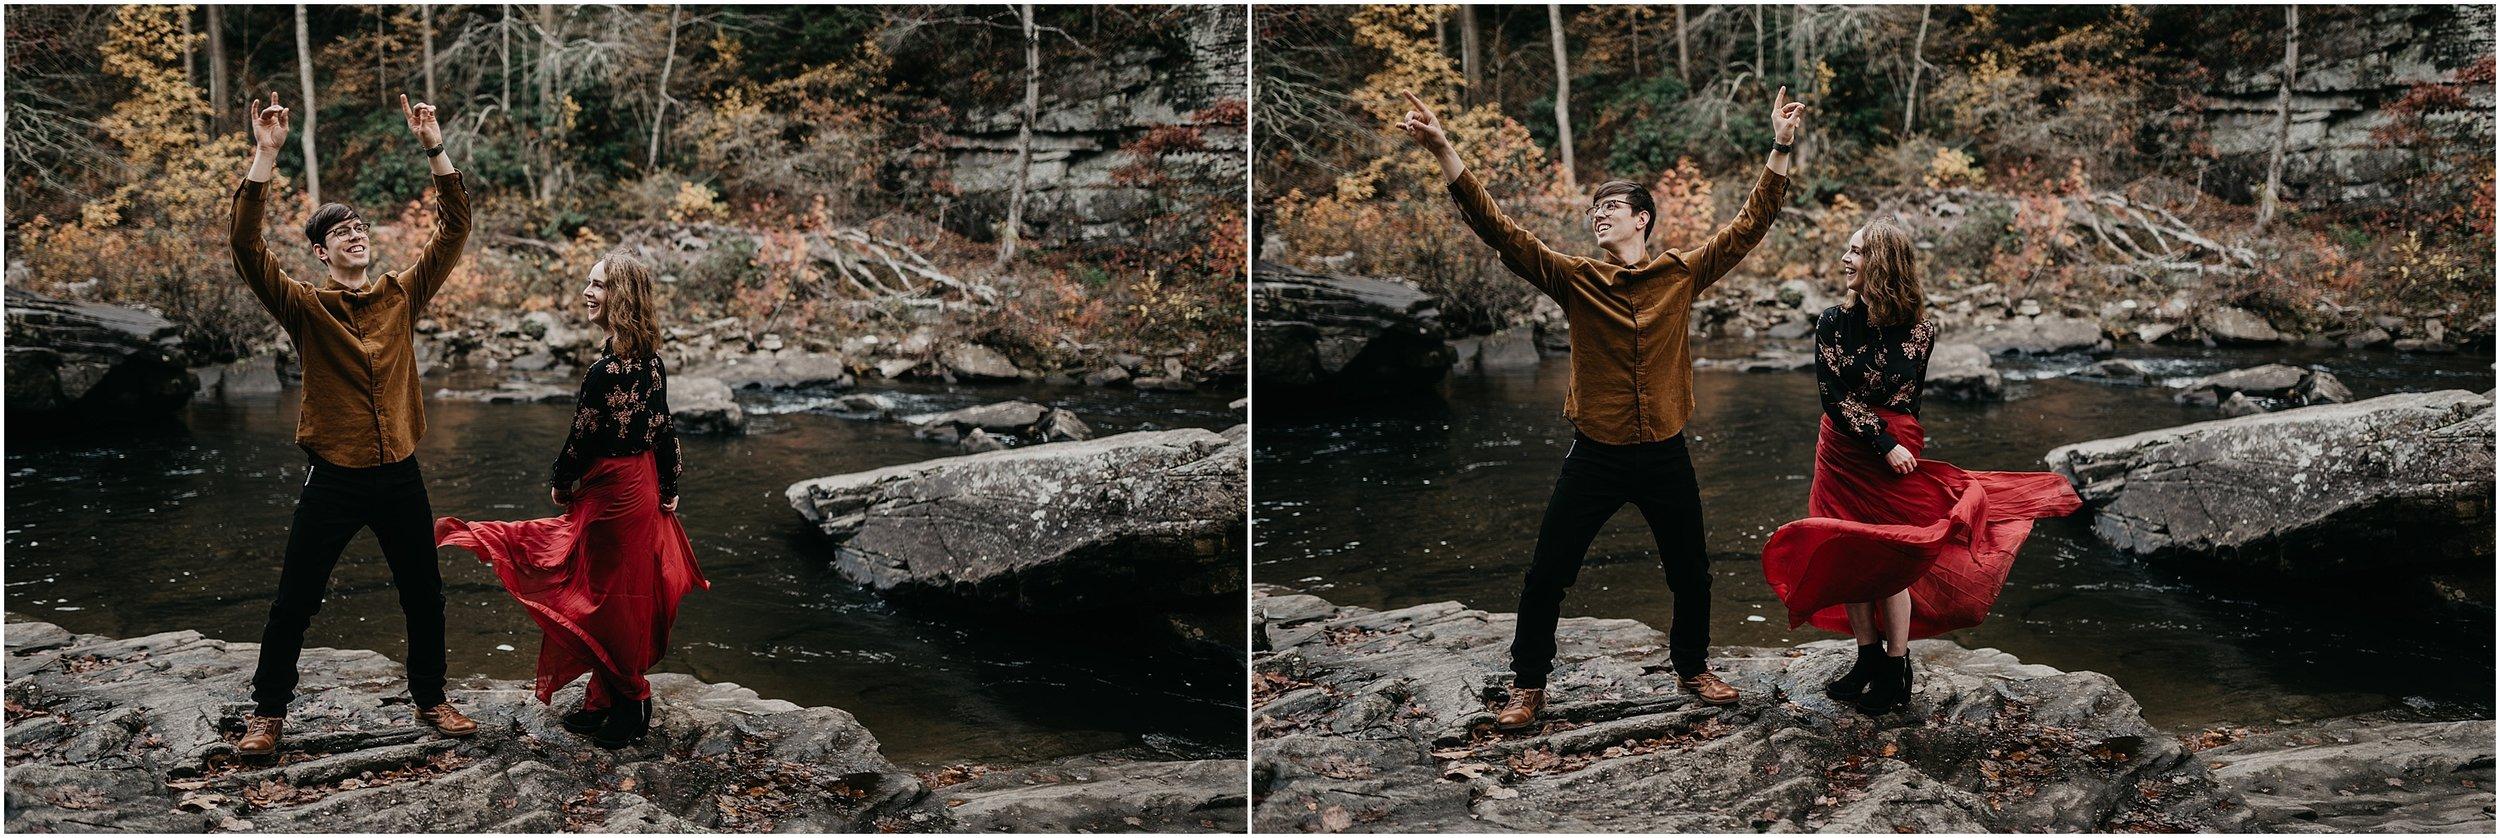 Chattanooga-Autumn-Engagement-17.jpg